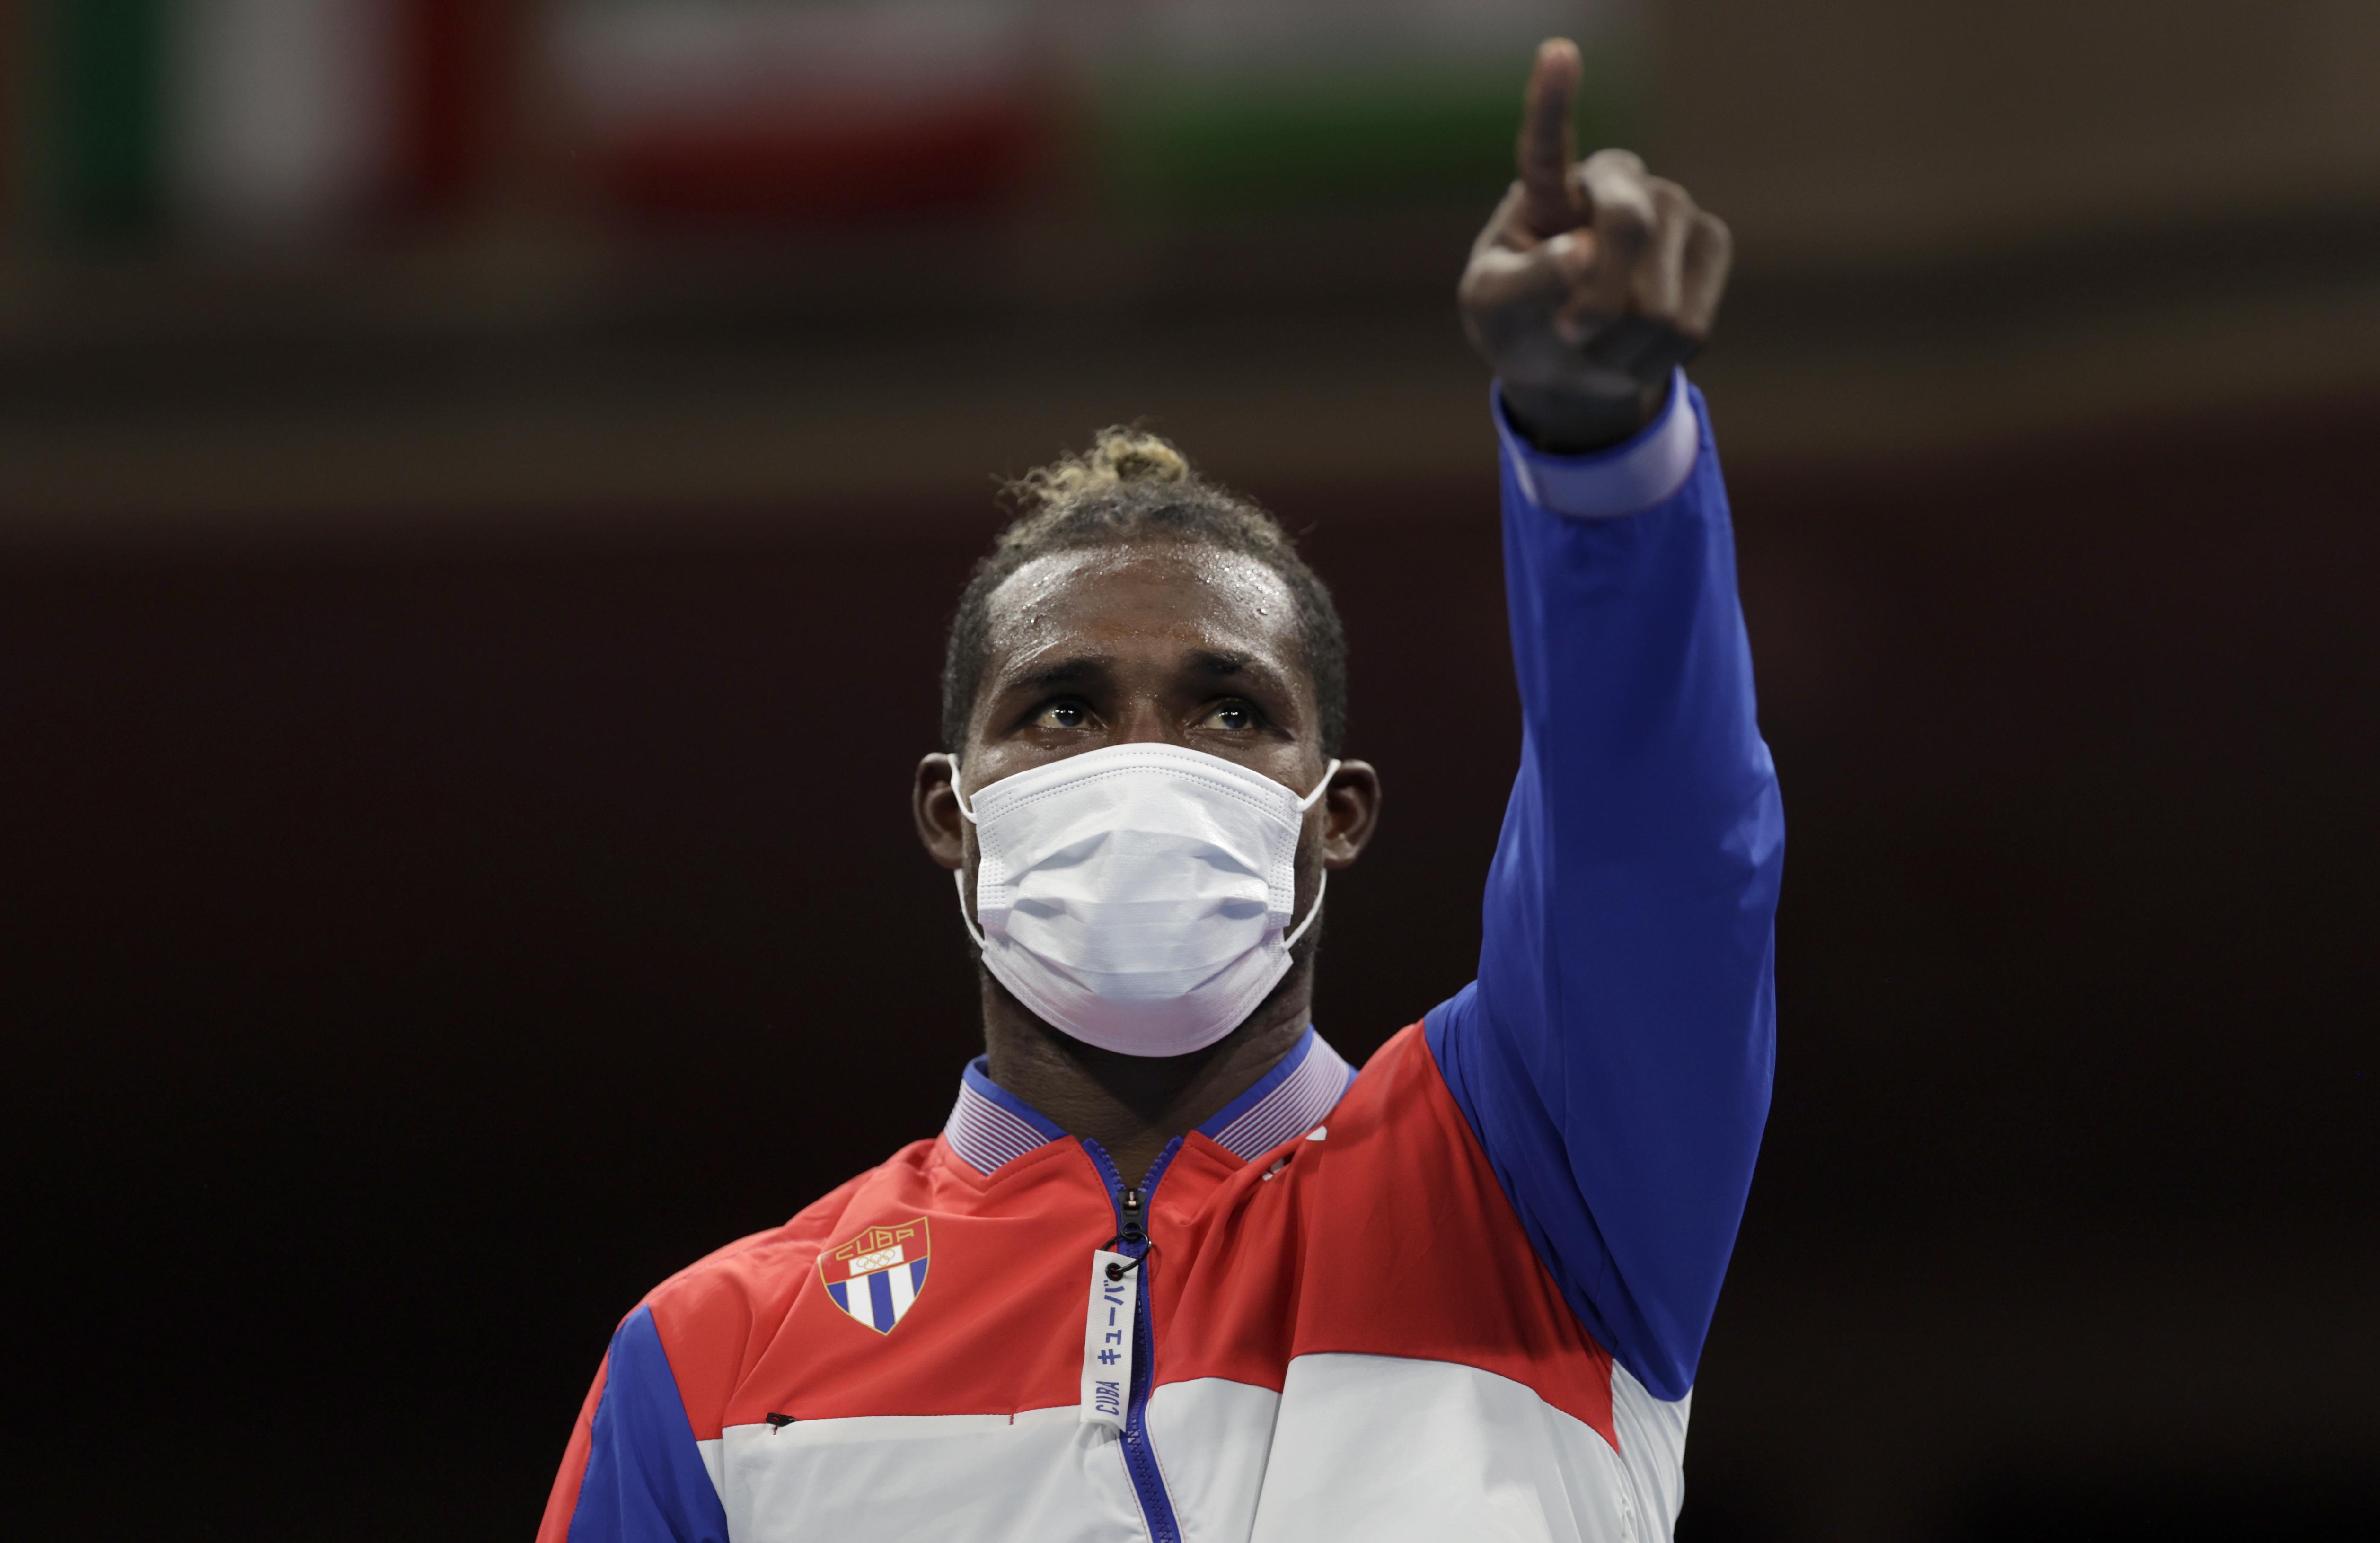 Tokyo 2020 Olympics - Boxing - Men's Heavyweight - Medal Ceremony - Kokugikan Arena - Tokyo, Japan - August 6, 2021. Gold medallist Julio Cesar La Cruz of Cuba poses for photos. REUTERS/Ueslei Marcelino